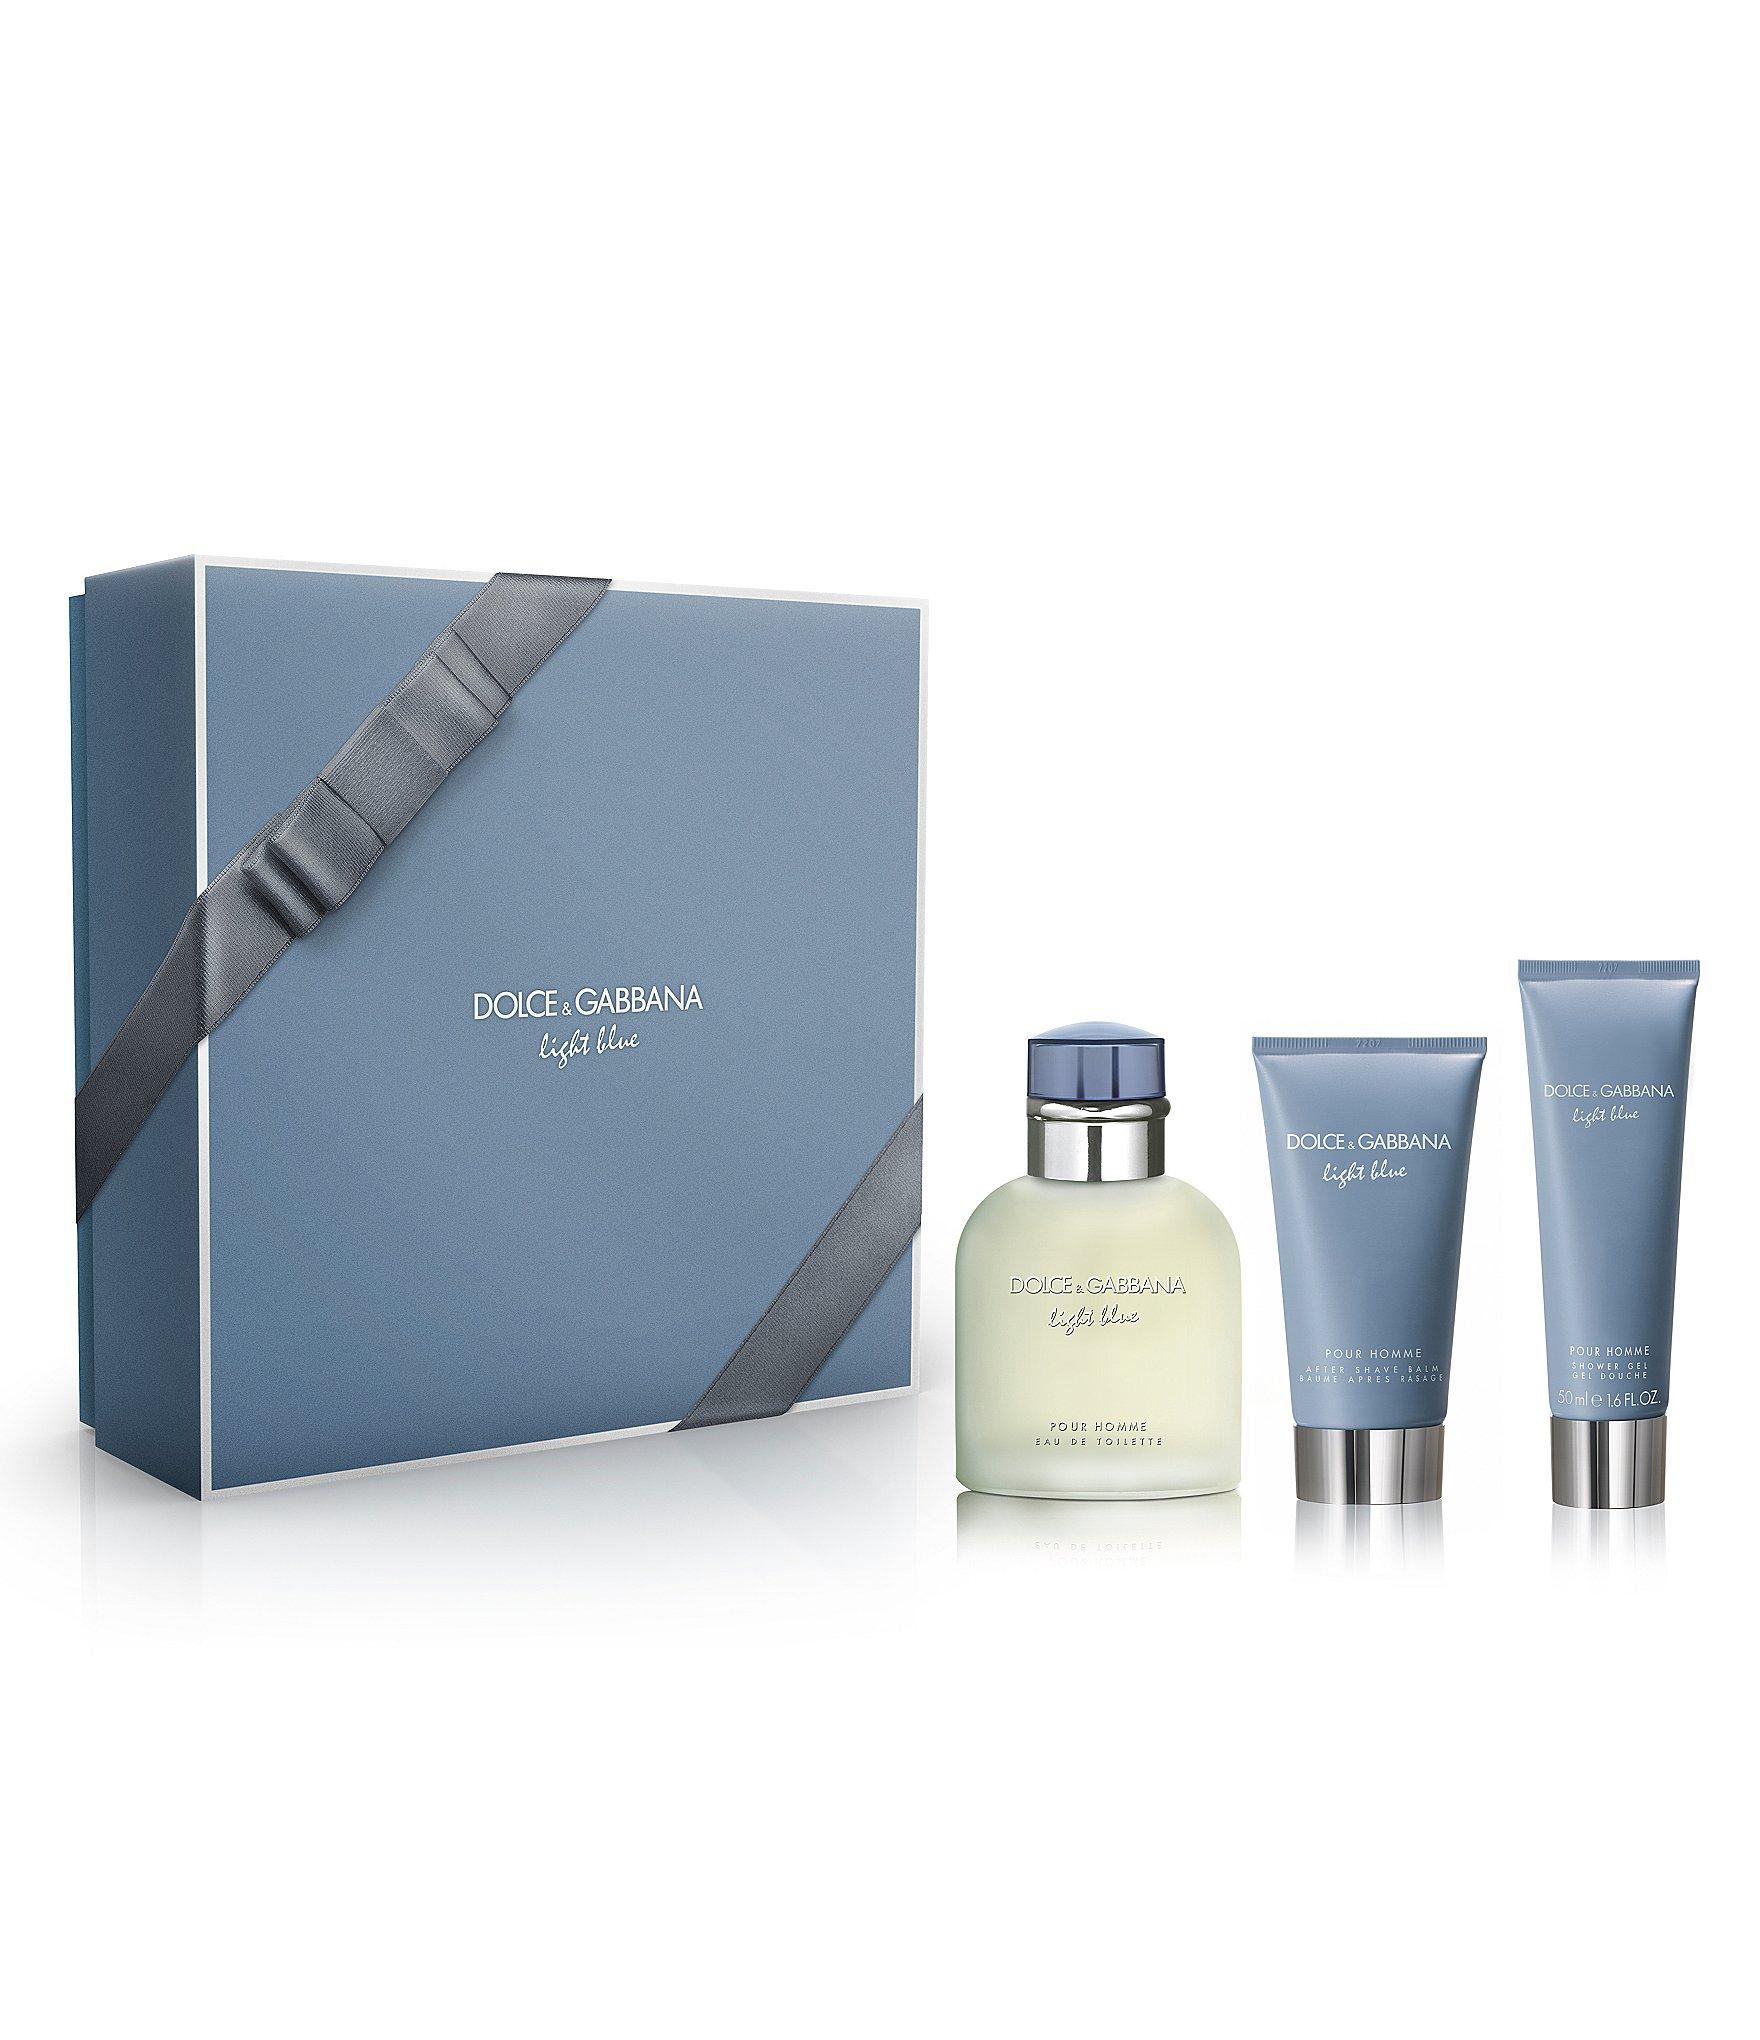 Dolce & Gabbana Light Blue Pour Homme Gift Set | Dillards